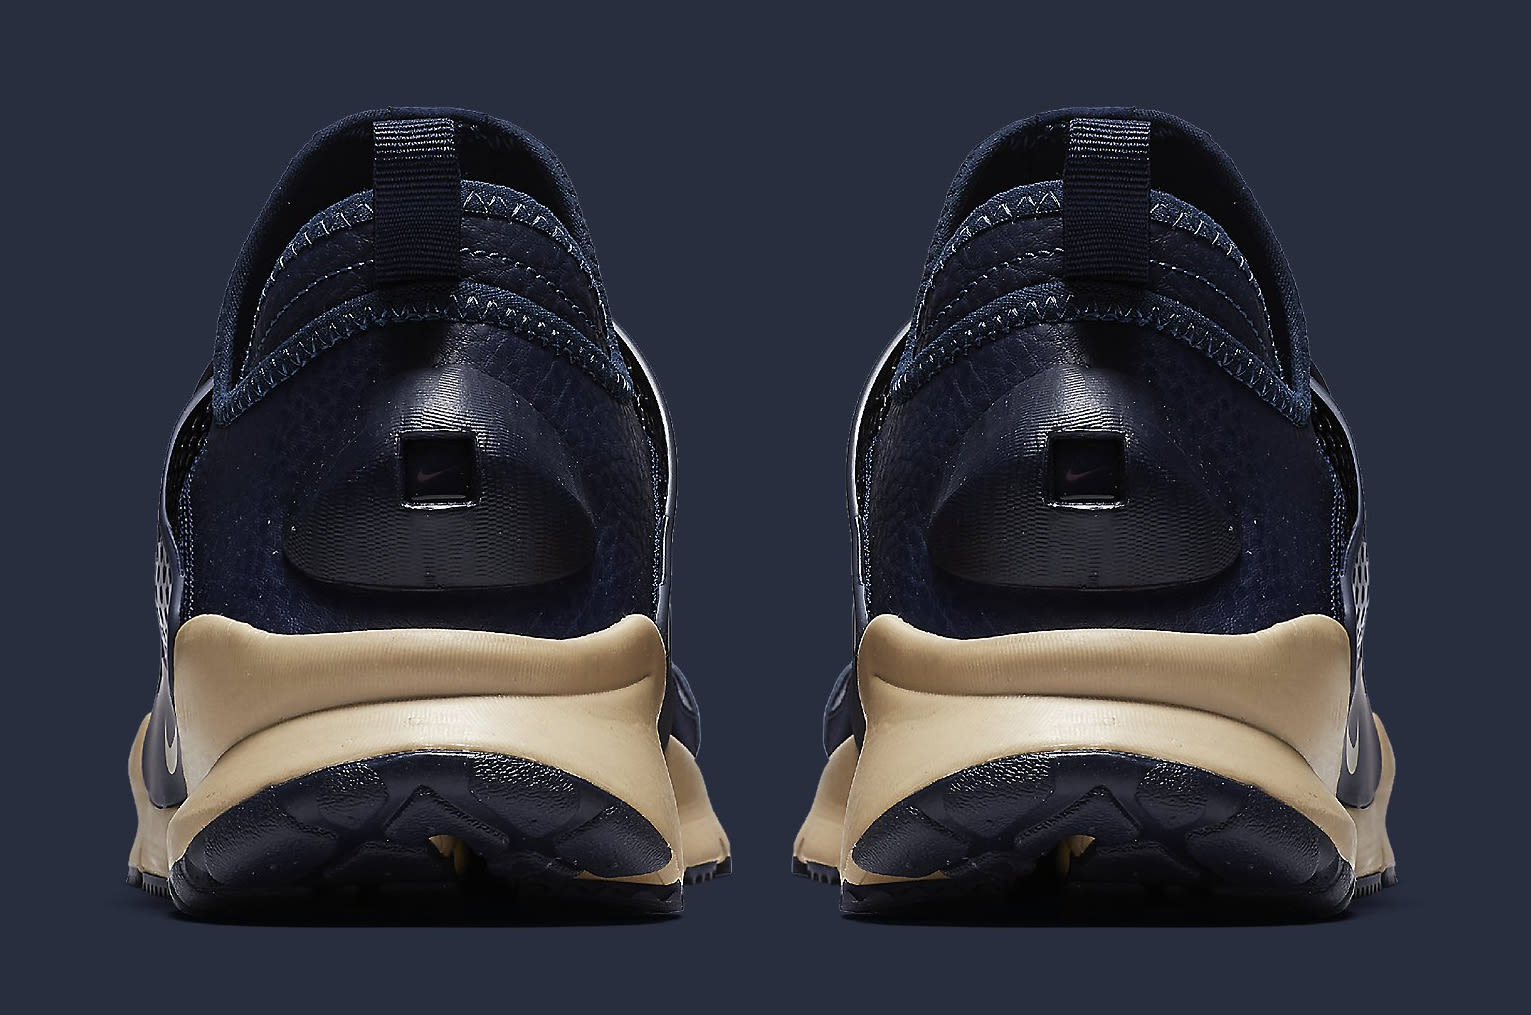 Stone Island Nike Sock Dart 910090-400 Heel